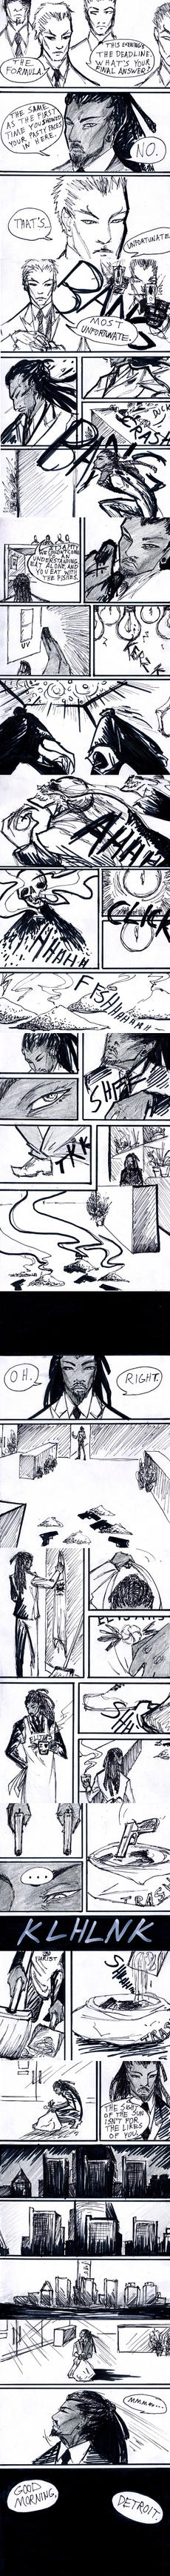 24 Hr Comic 2014 SET 3 by PhantomSeptember